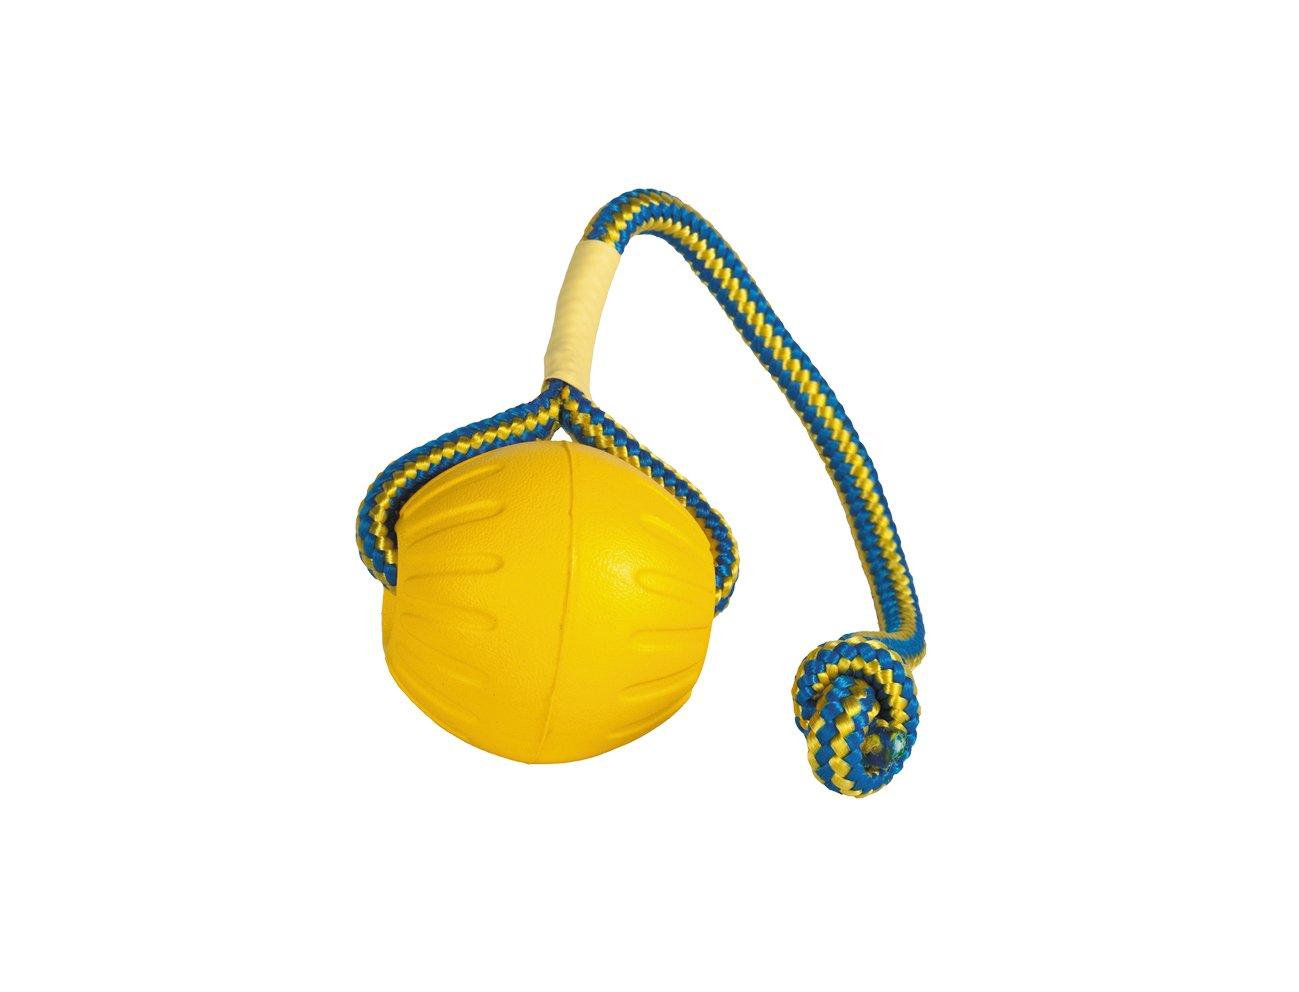 Starmark Swing 'n Fling DuraFoam Ball Dog Toy Medium